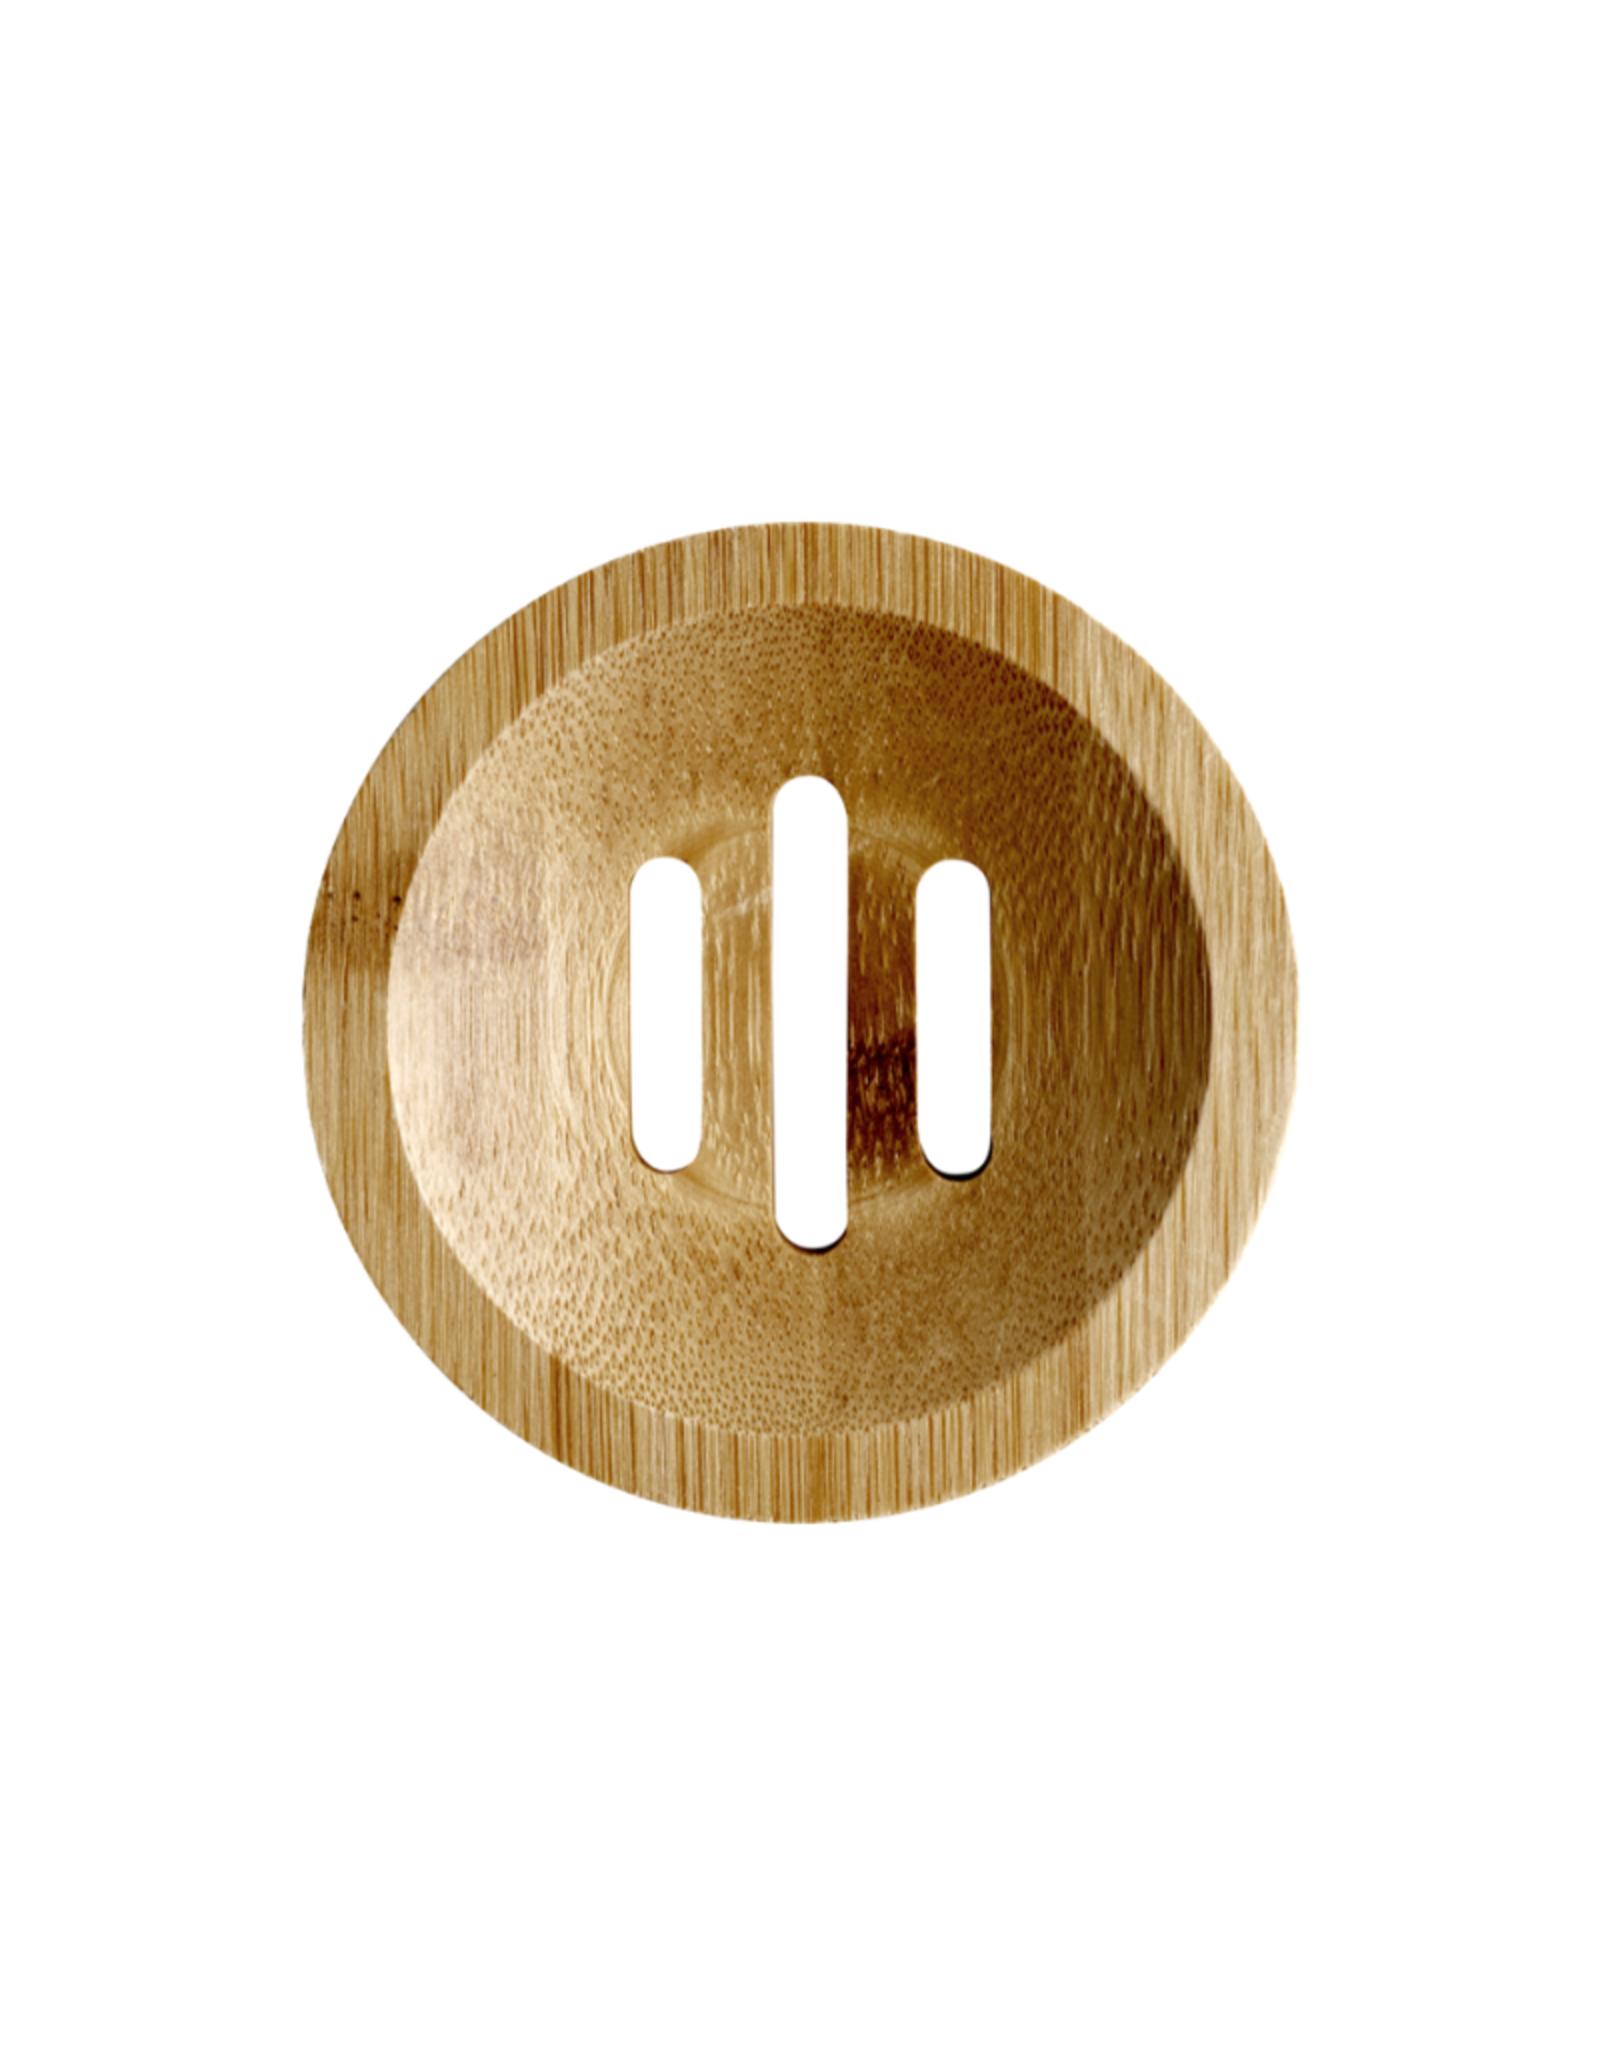 Lundegaardens Zeephouder   Bamboe